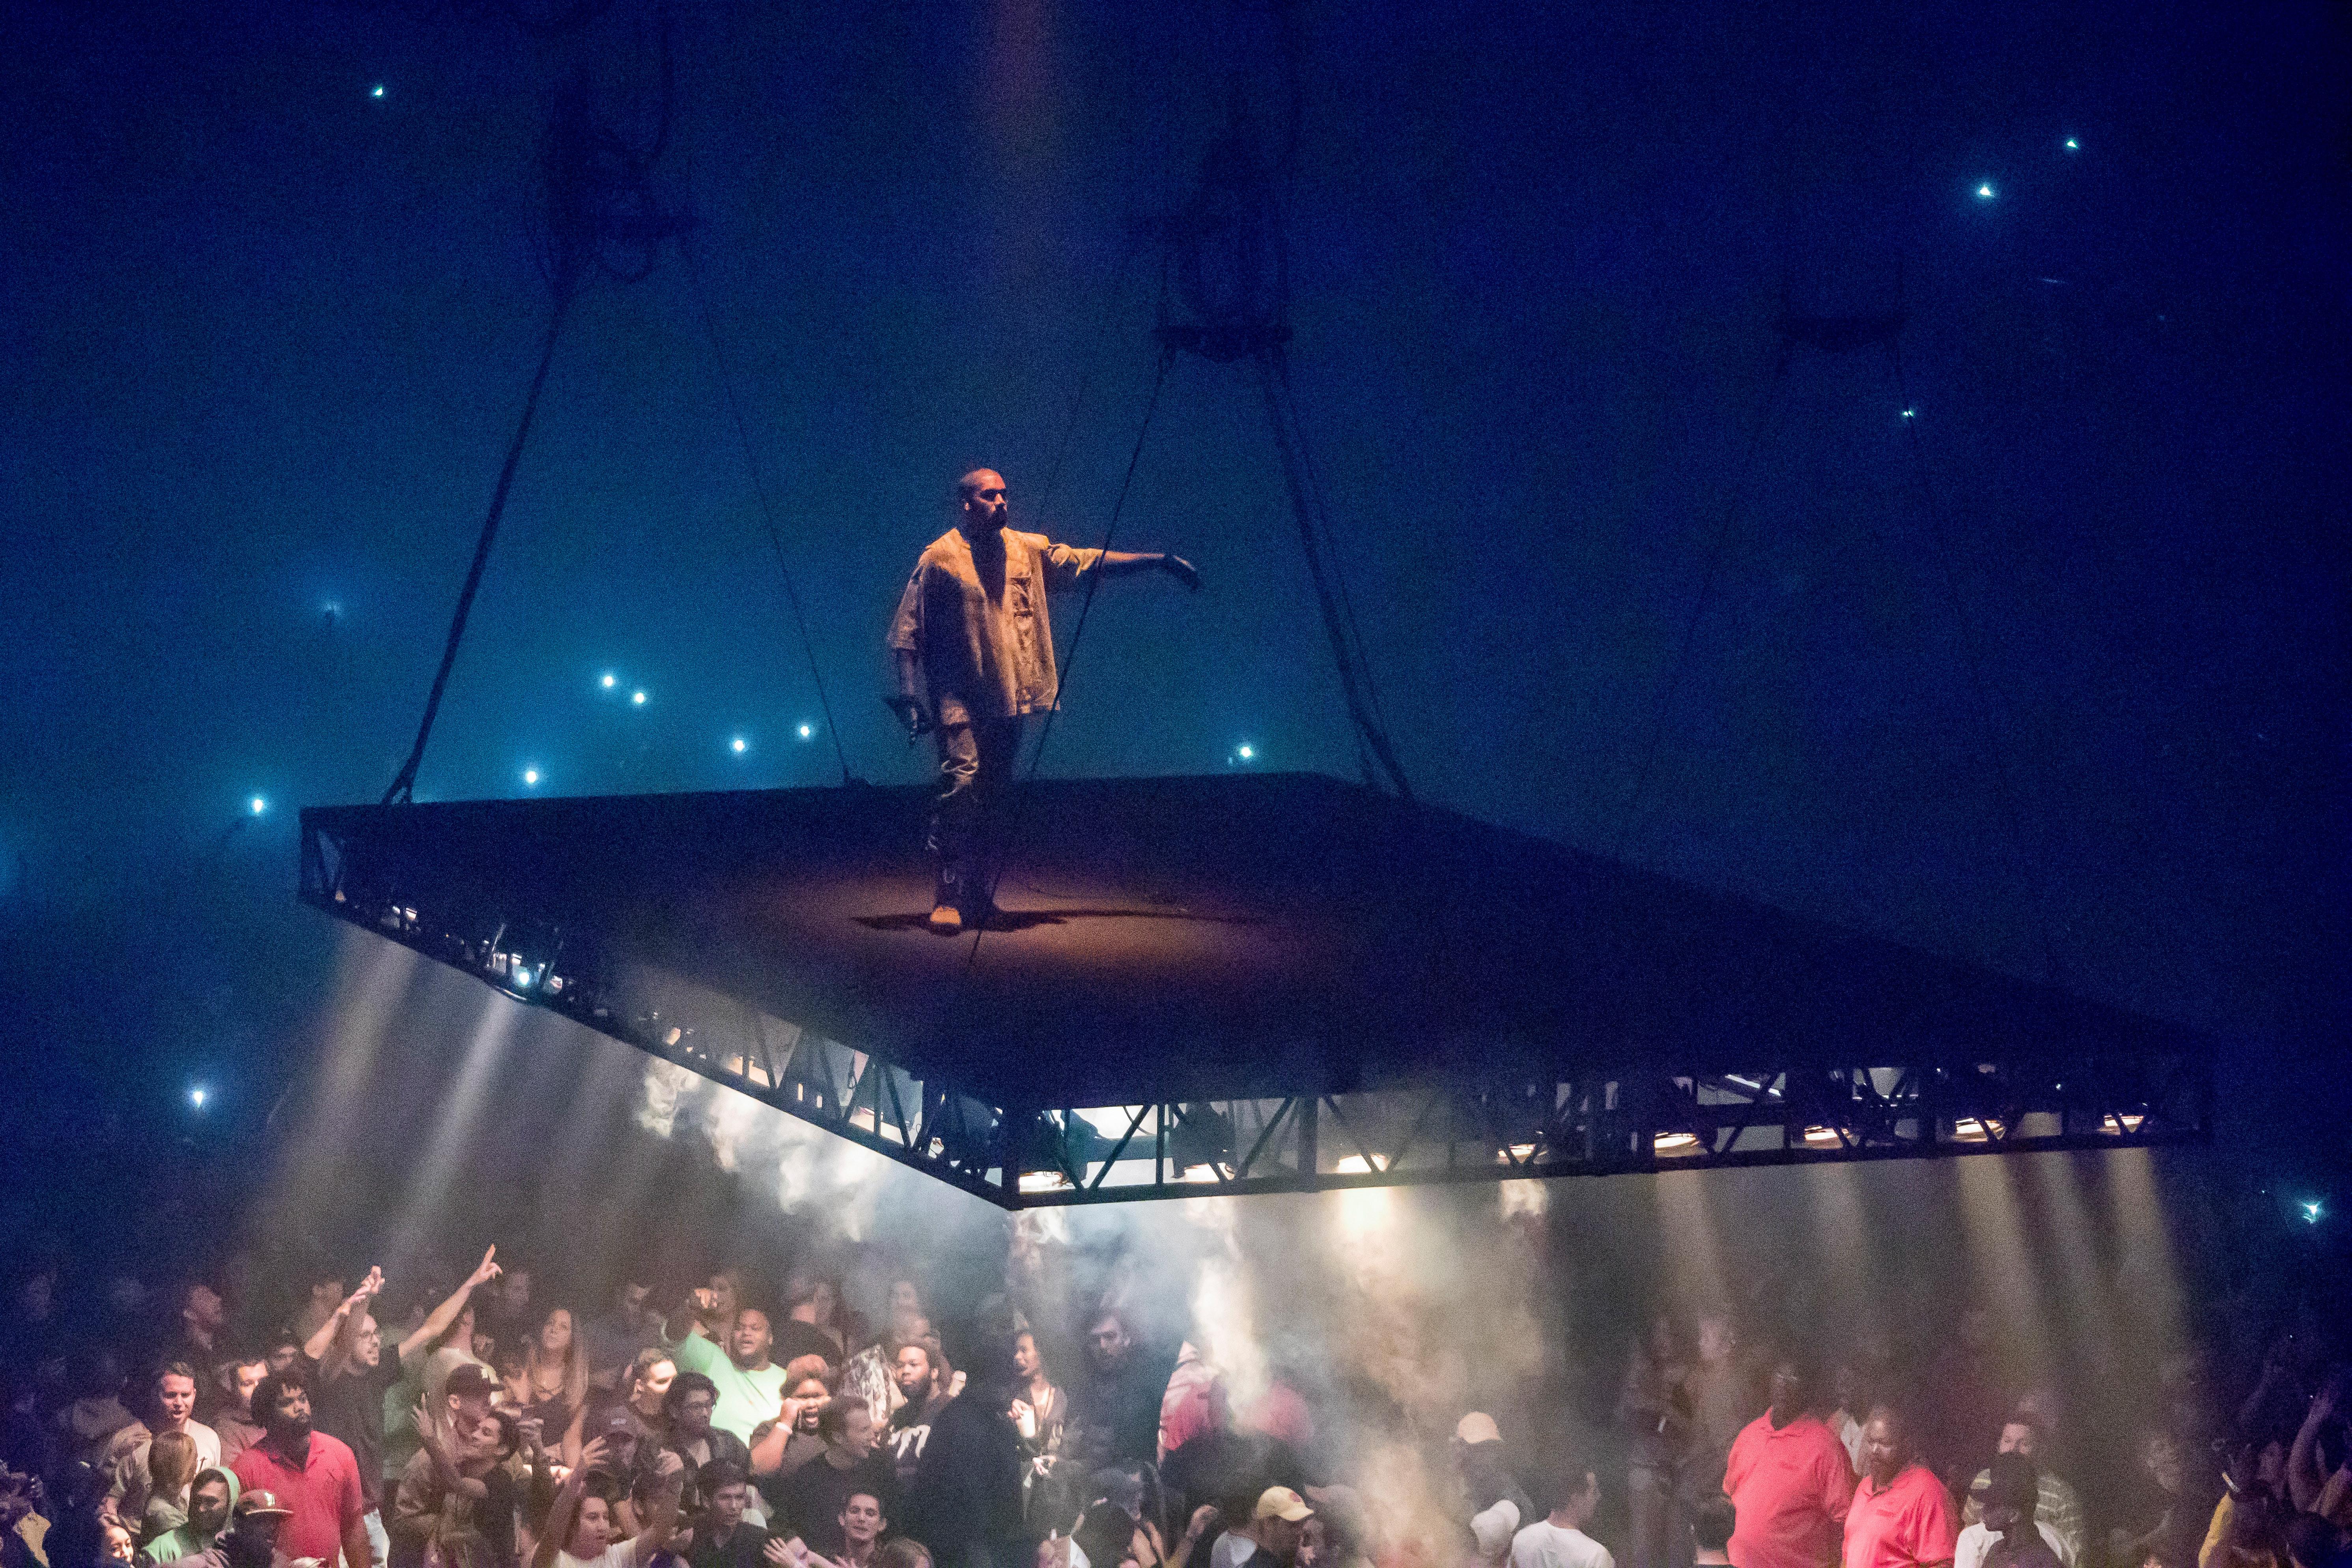 Kanye West In Concert - Detroit, Michigan